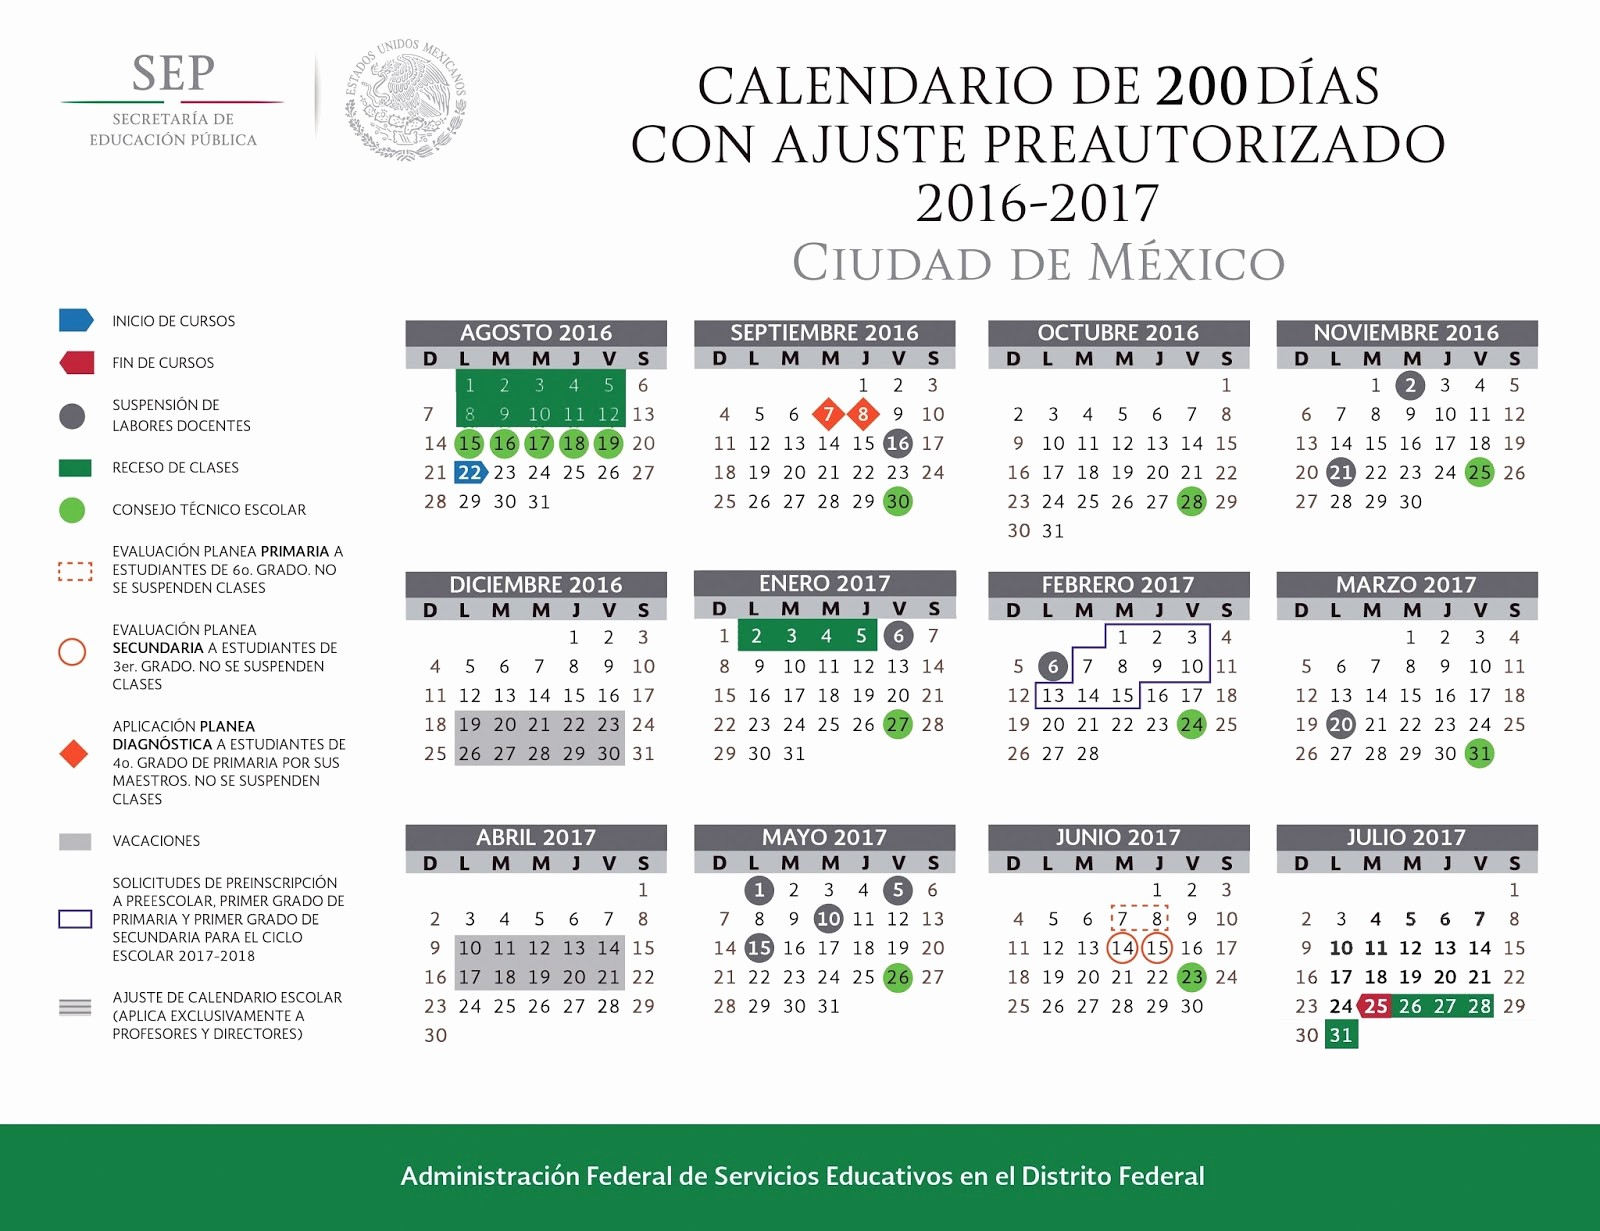 Calendari 2019 20 Jn Mazahua Calendario Escolar 2016 2017